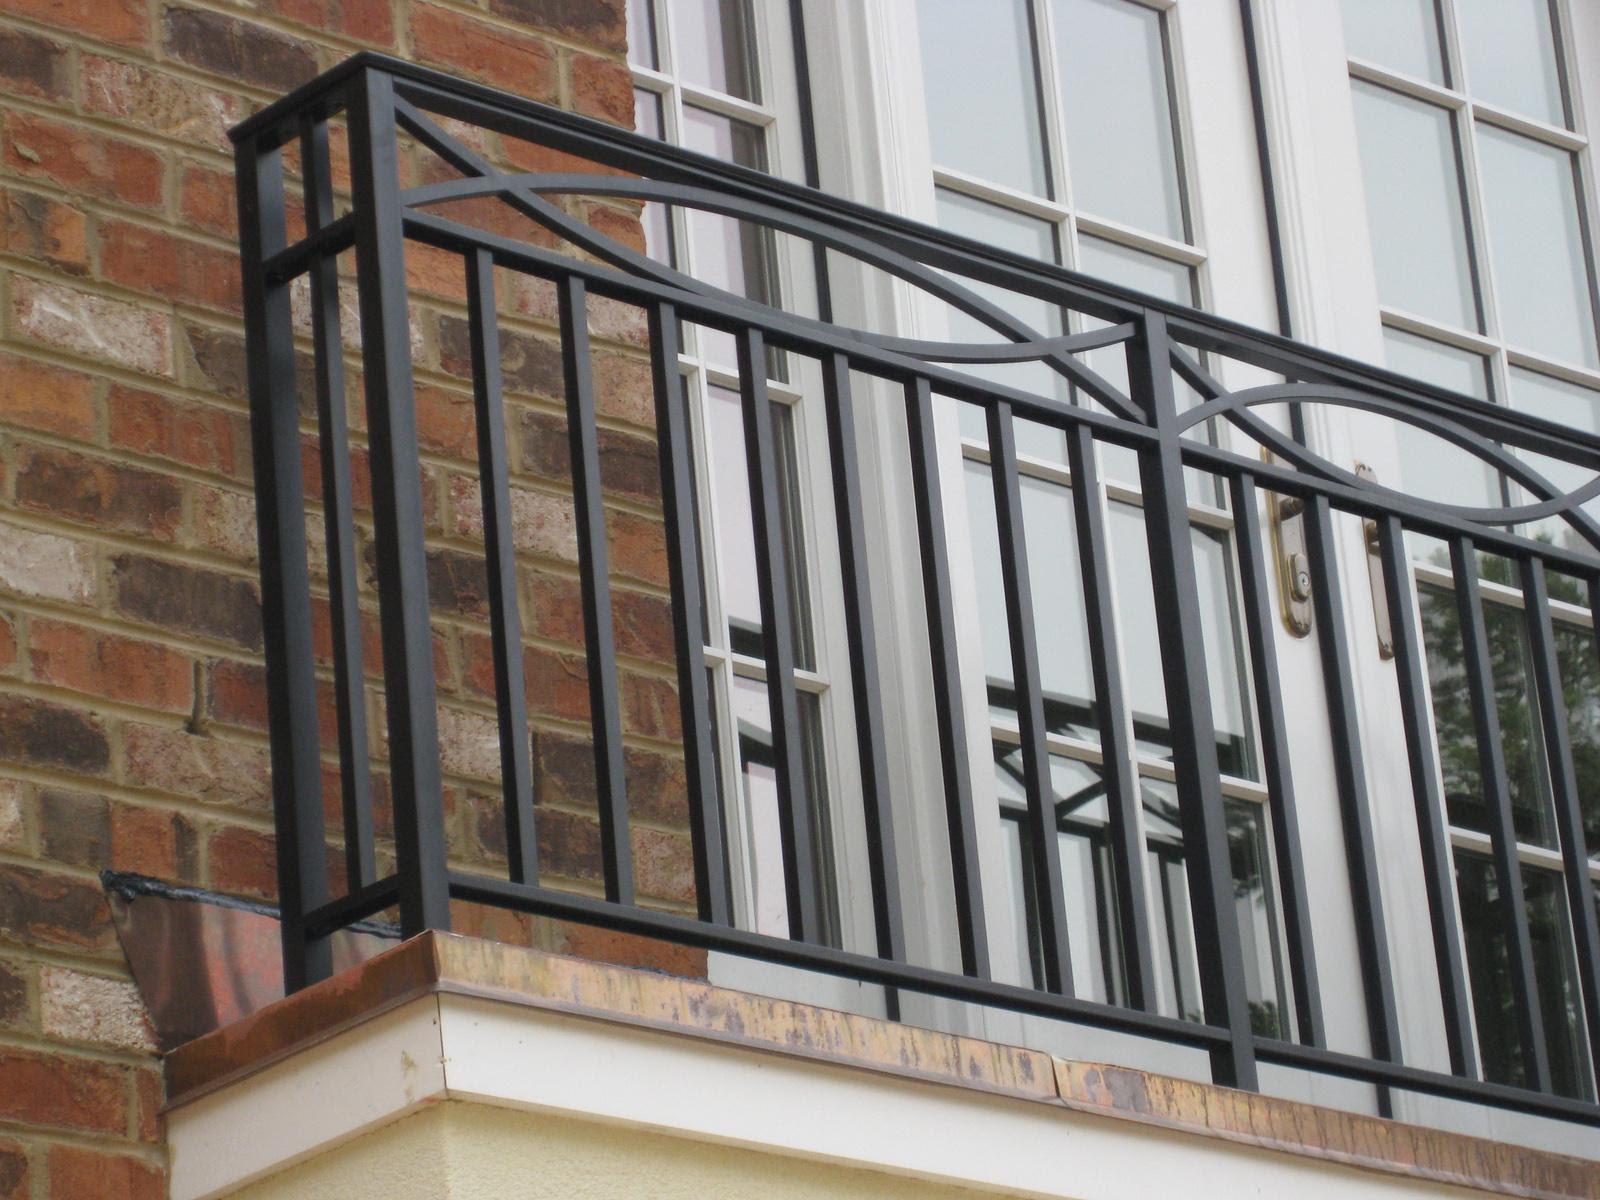 Greendale Railings Roof And Balcony